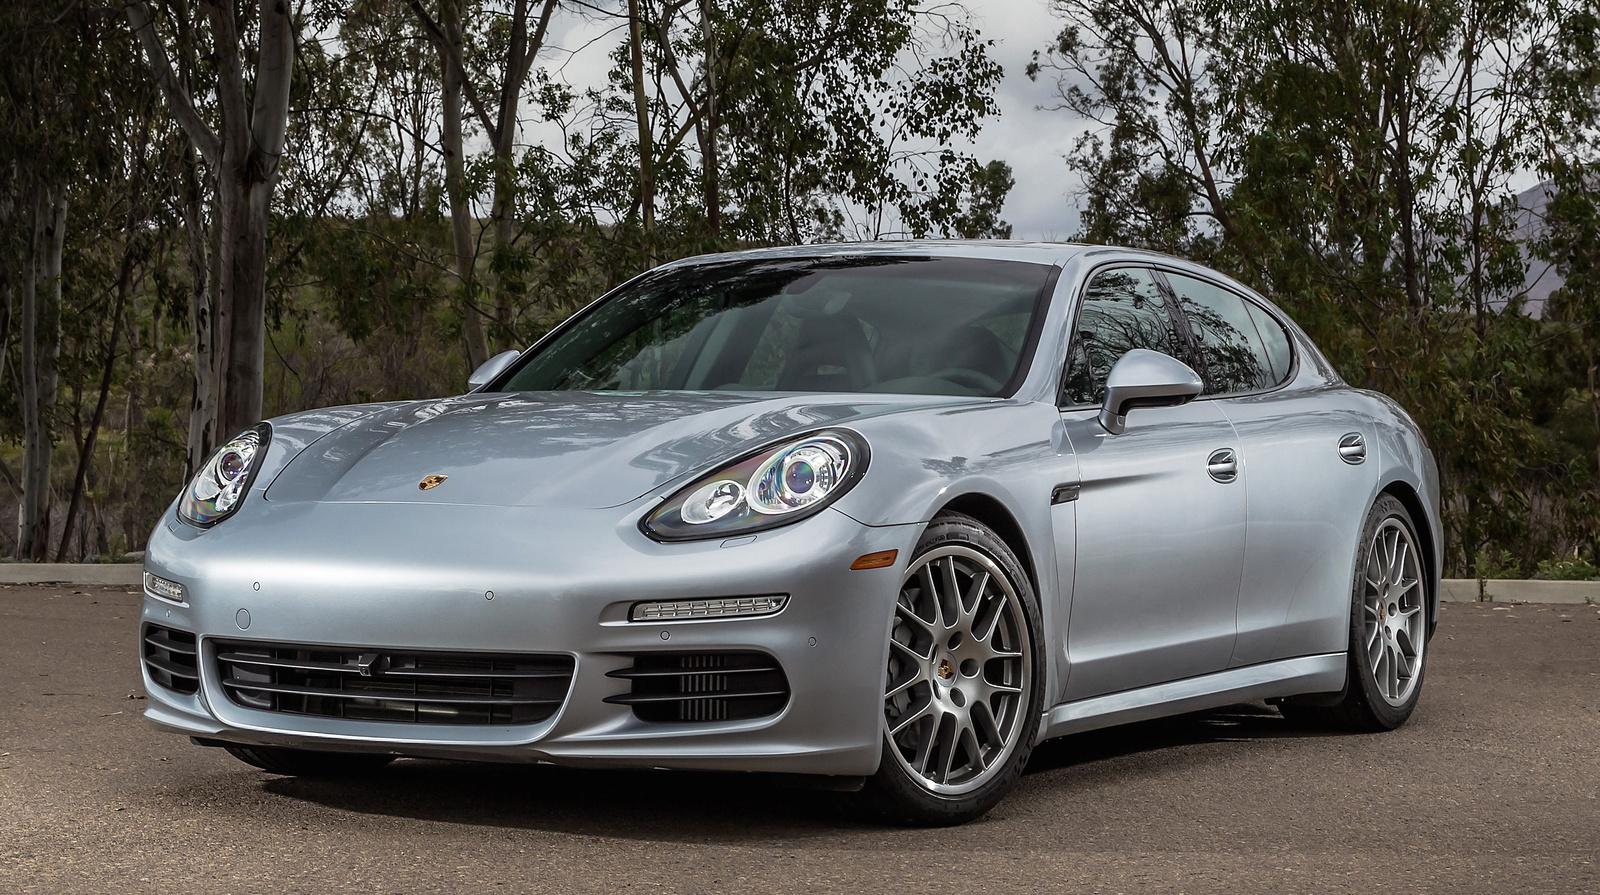 2016 Porsche Panamera - Overview - CarGurus